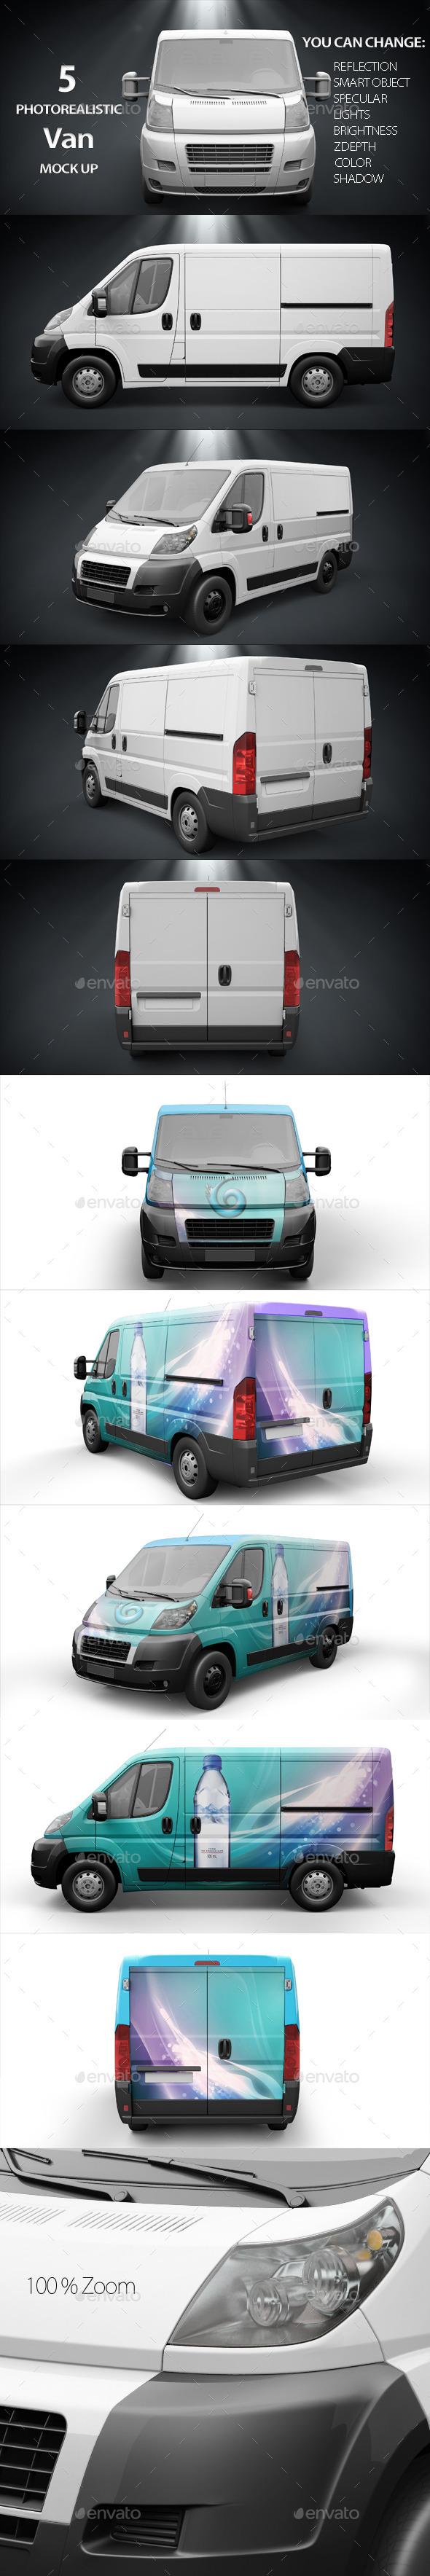 Van Mockup - Product Mock-Ups Graphics